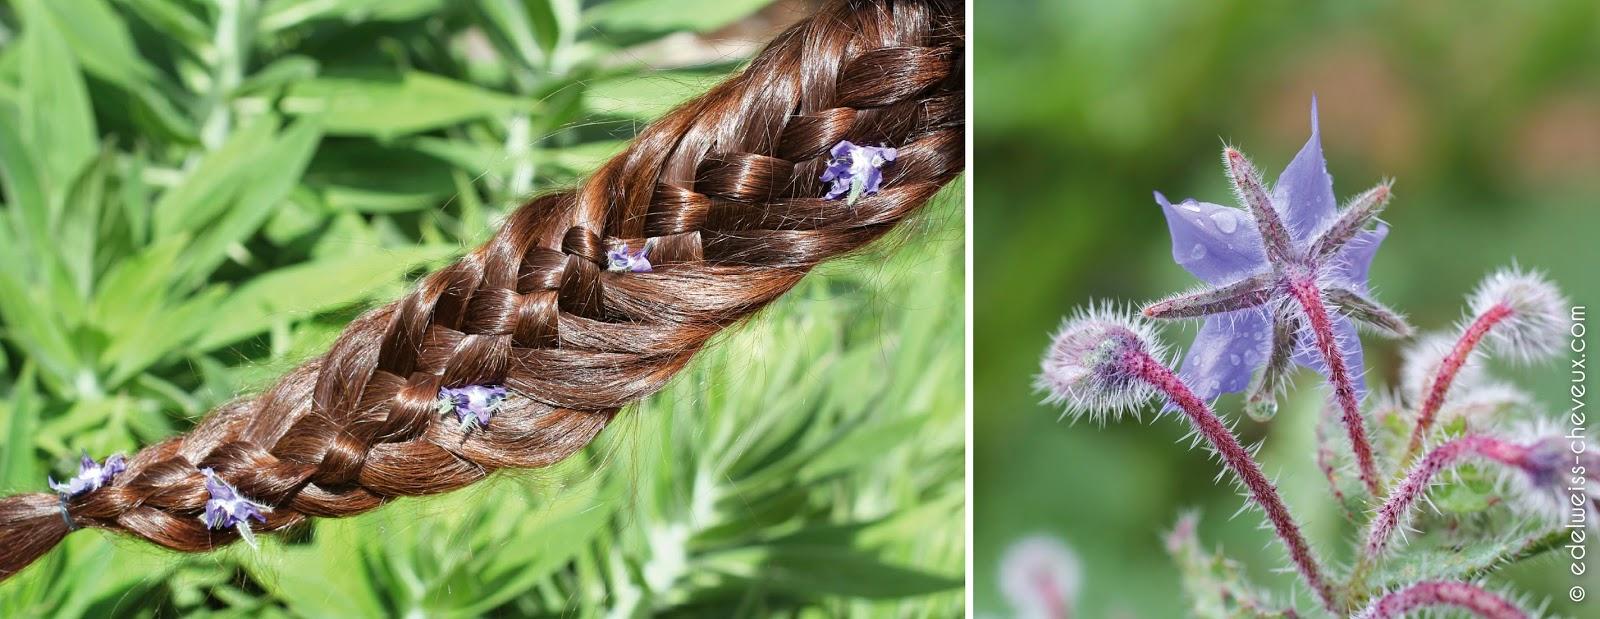 berthe guilhem soin naturel artisanal cheveux brillance tresse